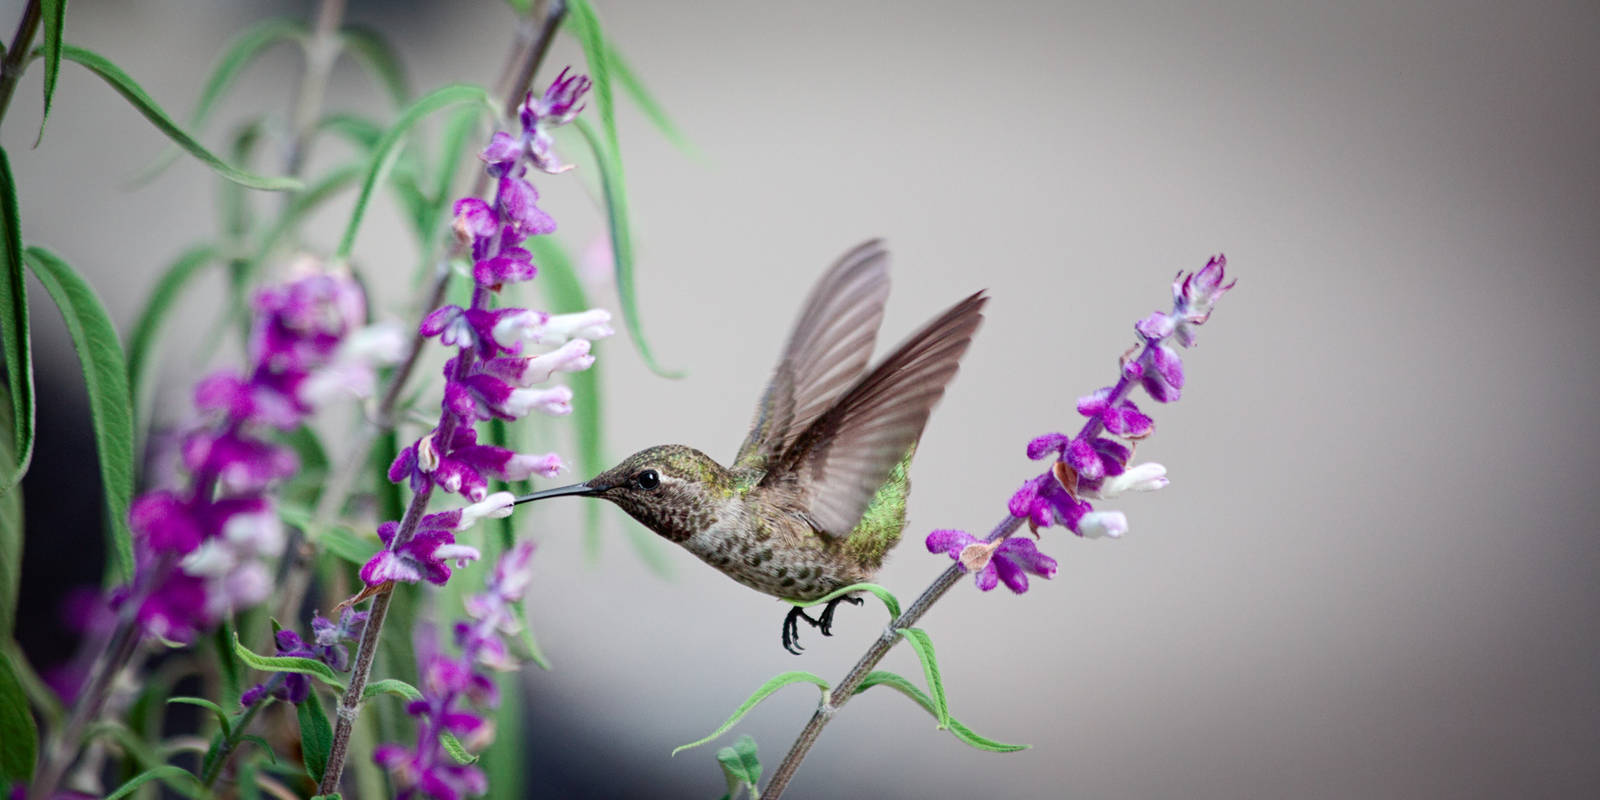 Hummingbird by JoelFaber